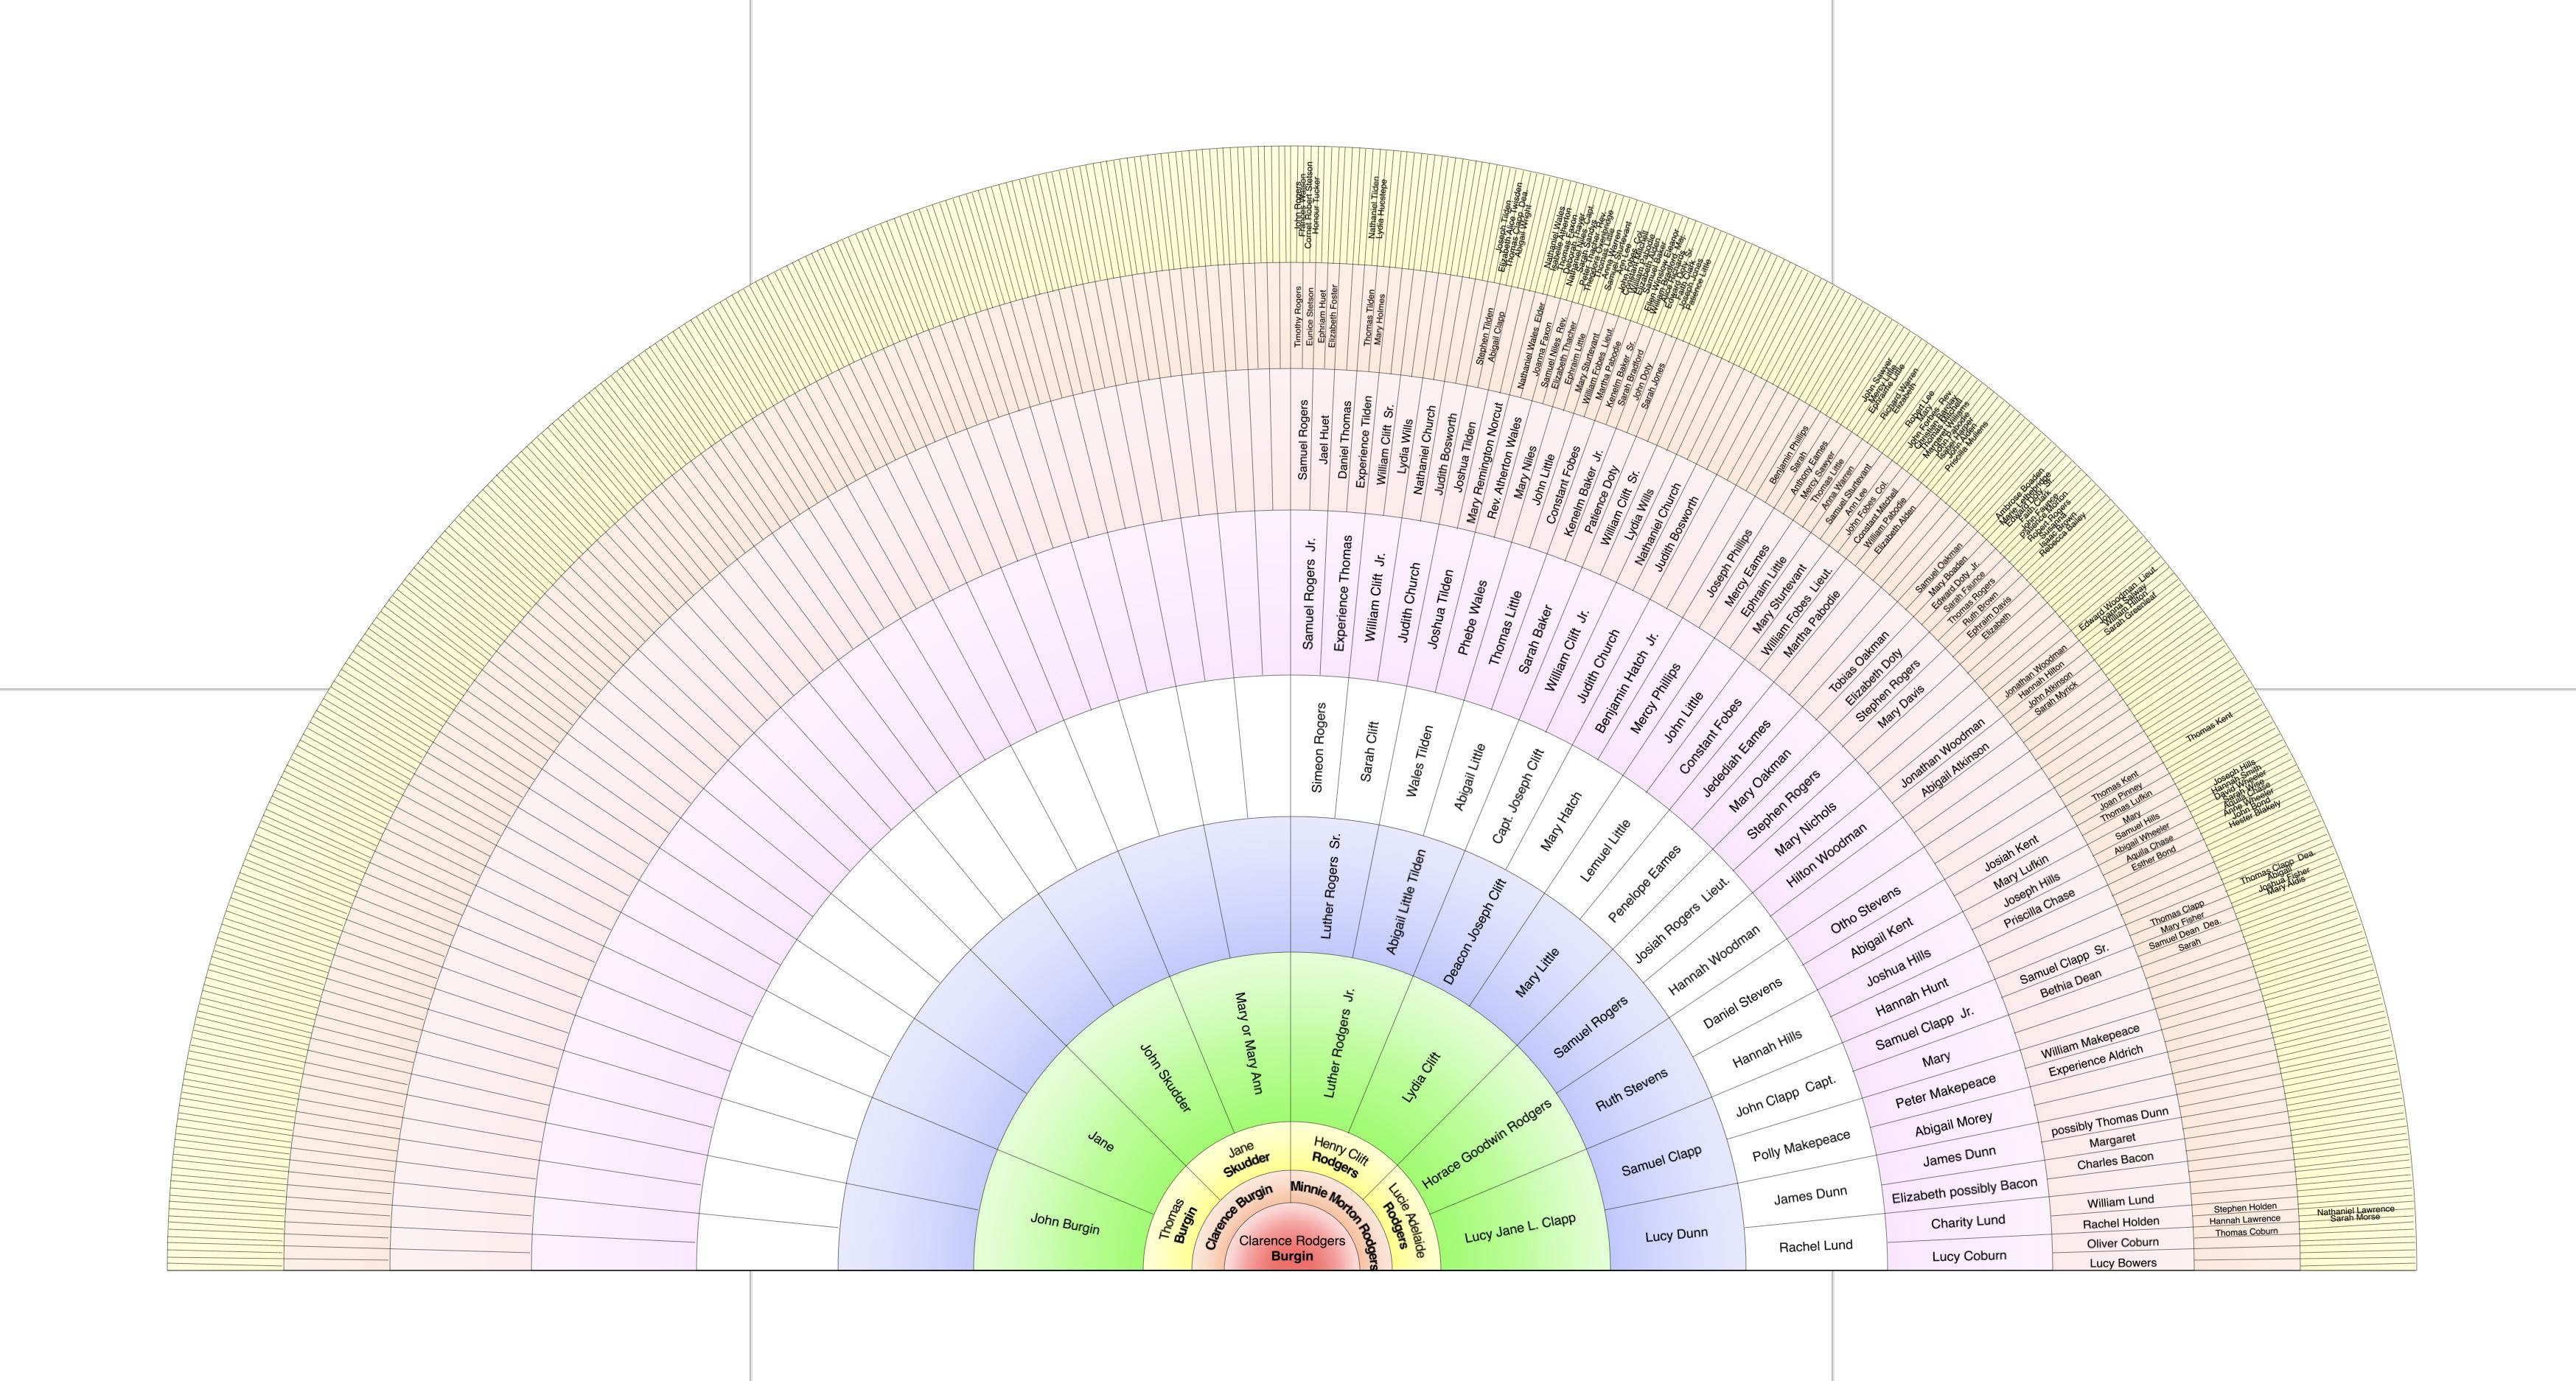 fan-chart-showing-burgin-info-shadow